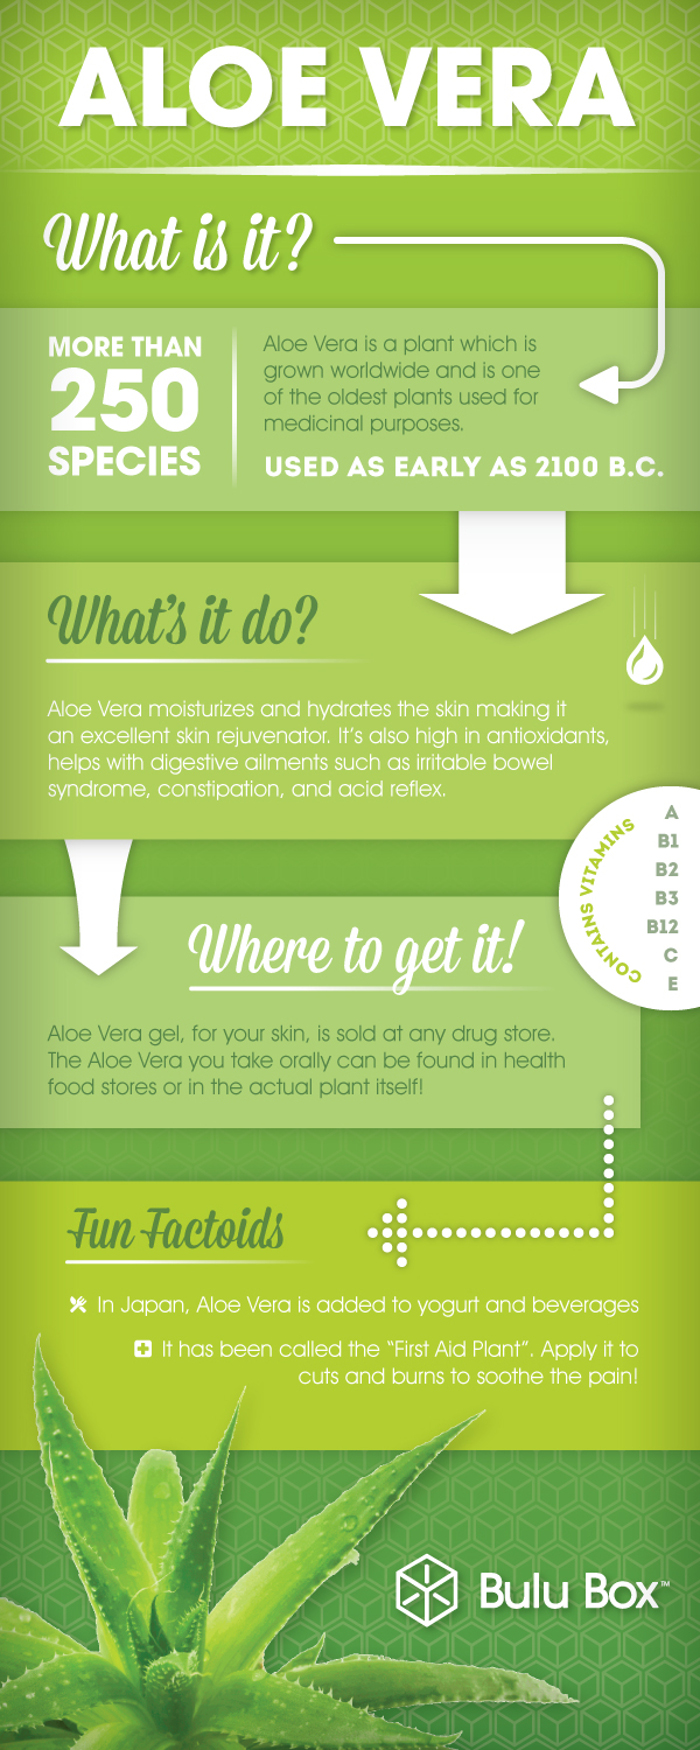 How to transplant aloe 94